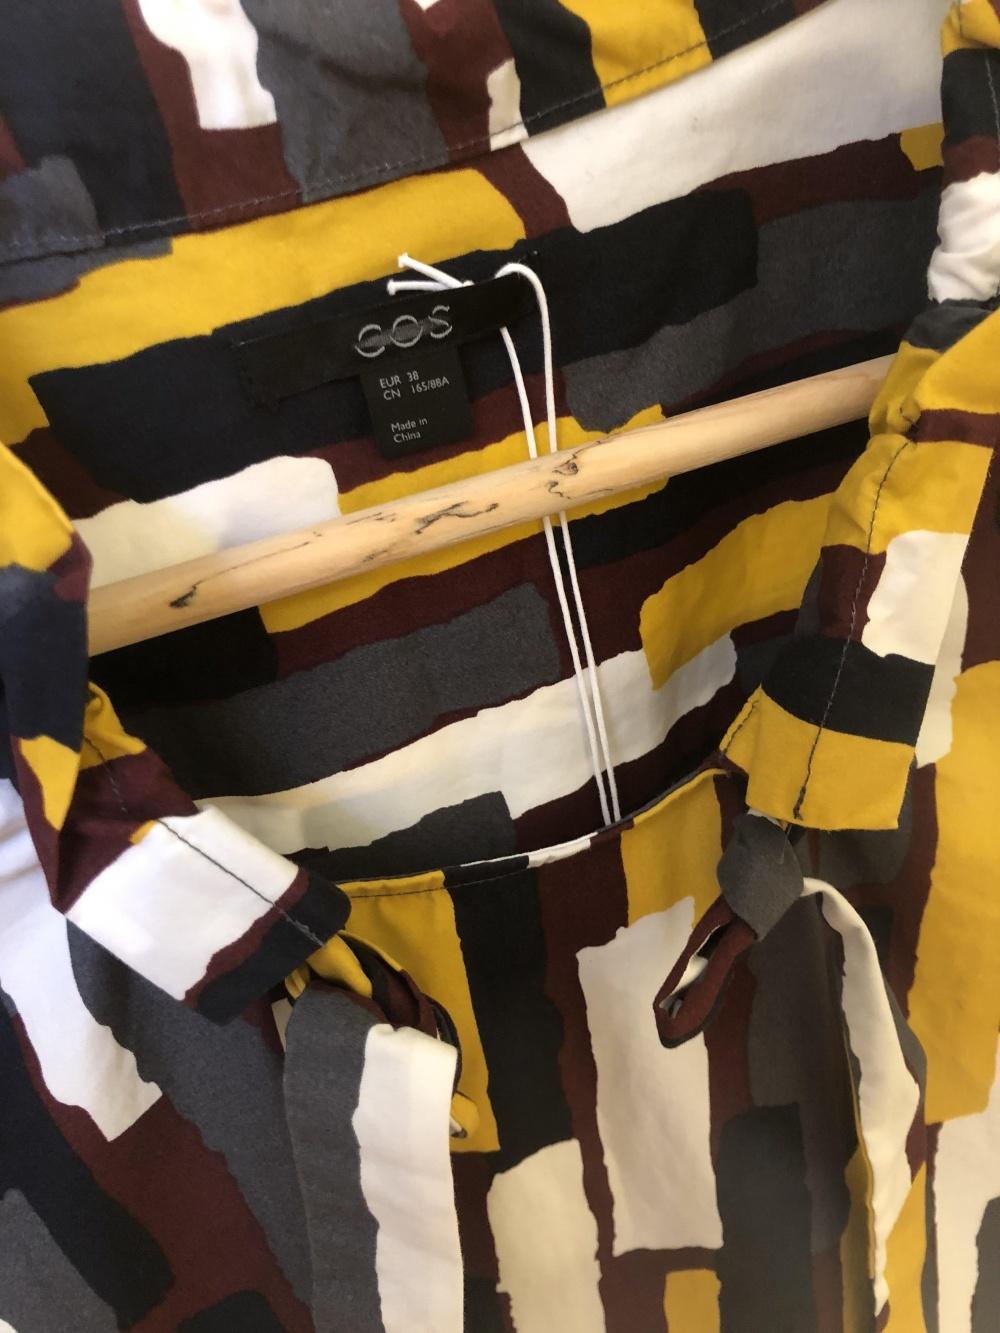 Блуза COS (EUR 38, RUS 44-46)